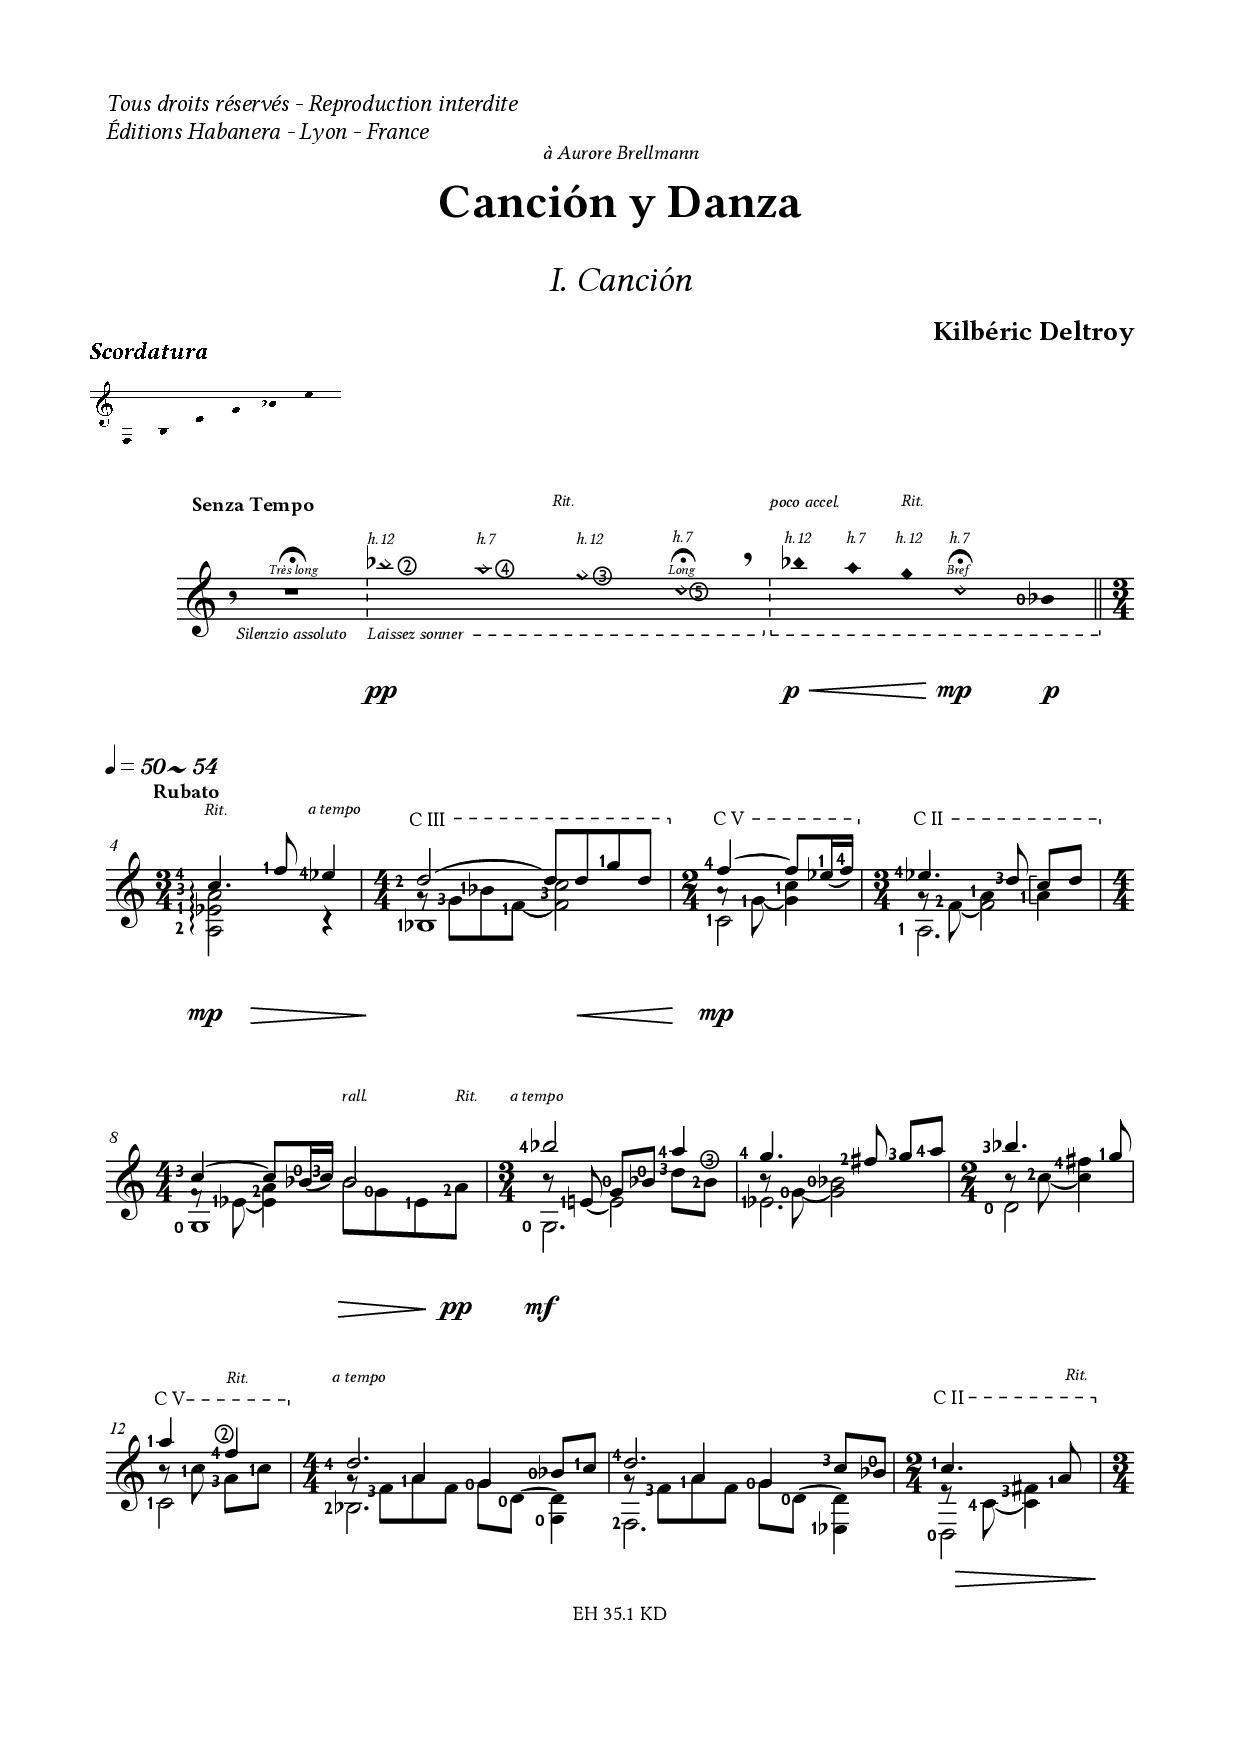 Eh 35 1 kd cancion y danza kilberic deltroy extrait